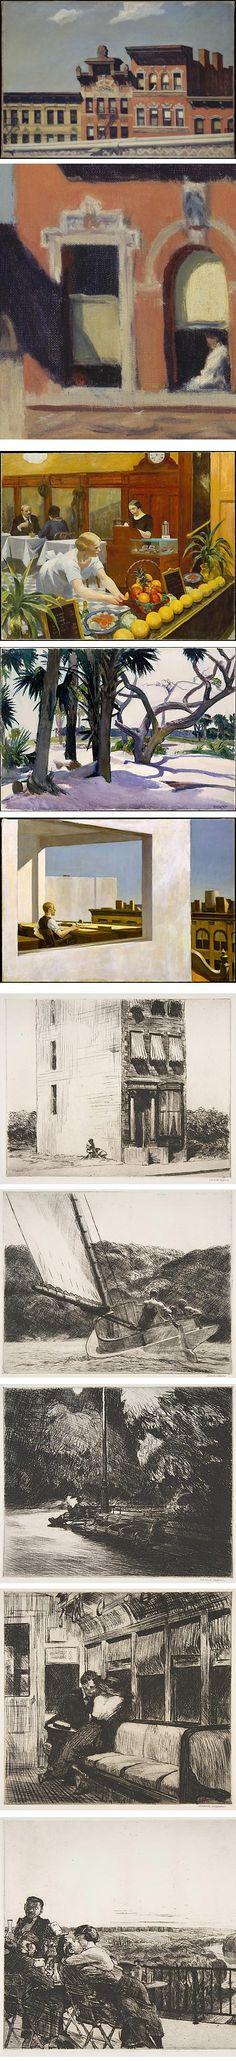 Edward Hopper on Met Museum website http://www.linesandcolors.com/